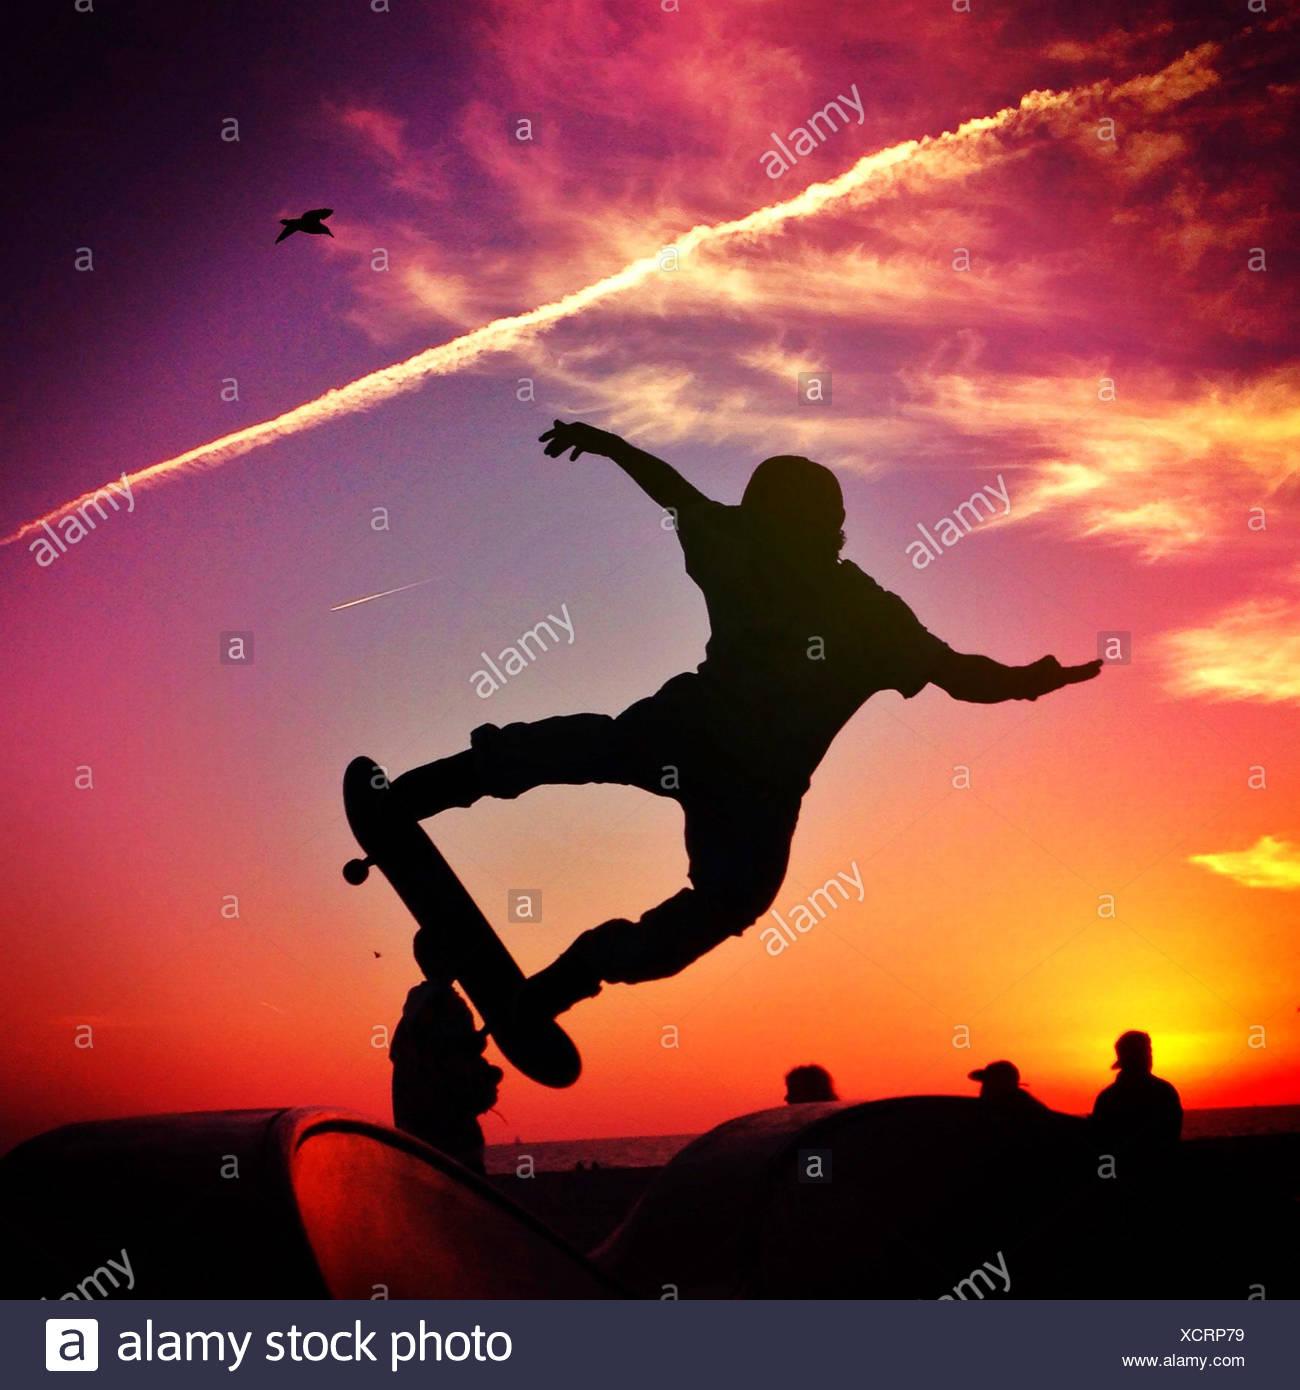 Silhouette of man Skateboarding at sunset - Stock Image